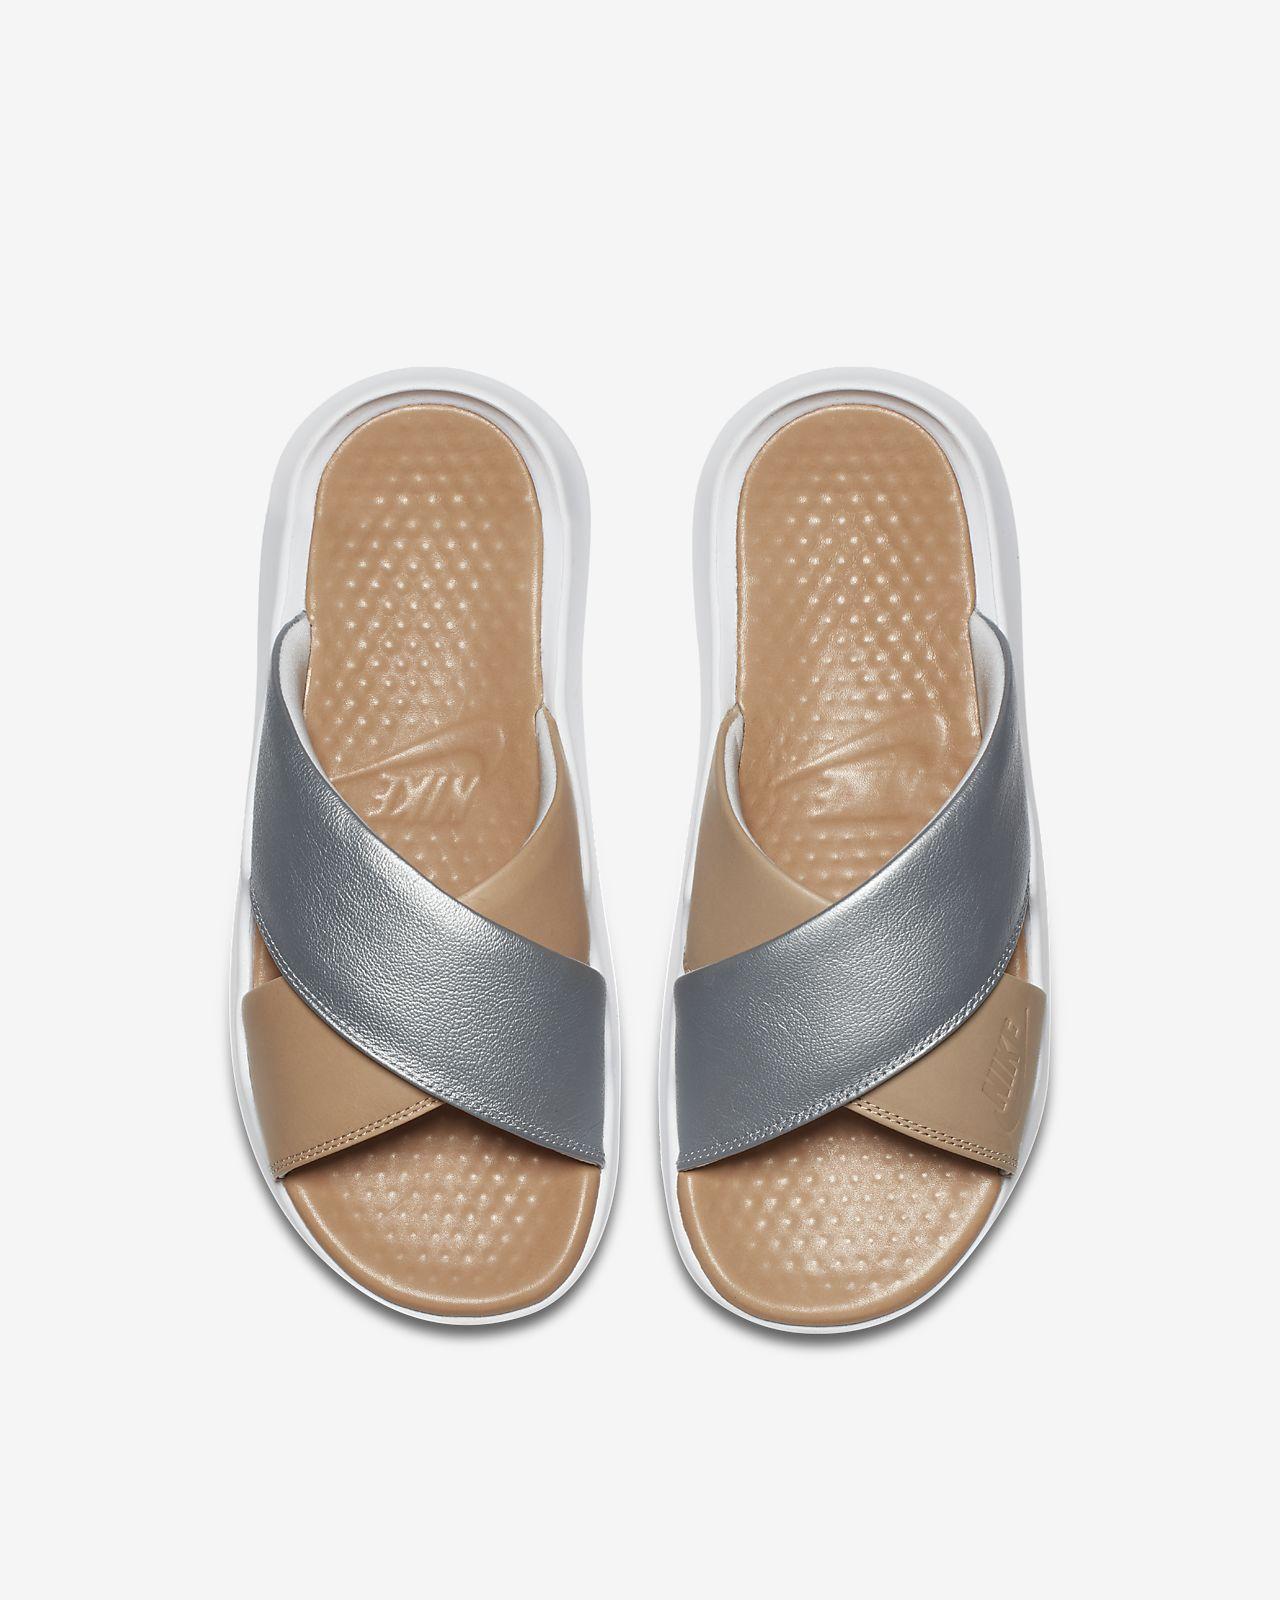 048a014b089 Sandalia para mujer Nike Benassi Future Cross SE Premium. Nike.com PR